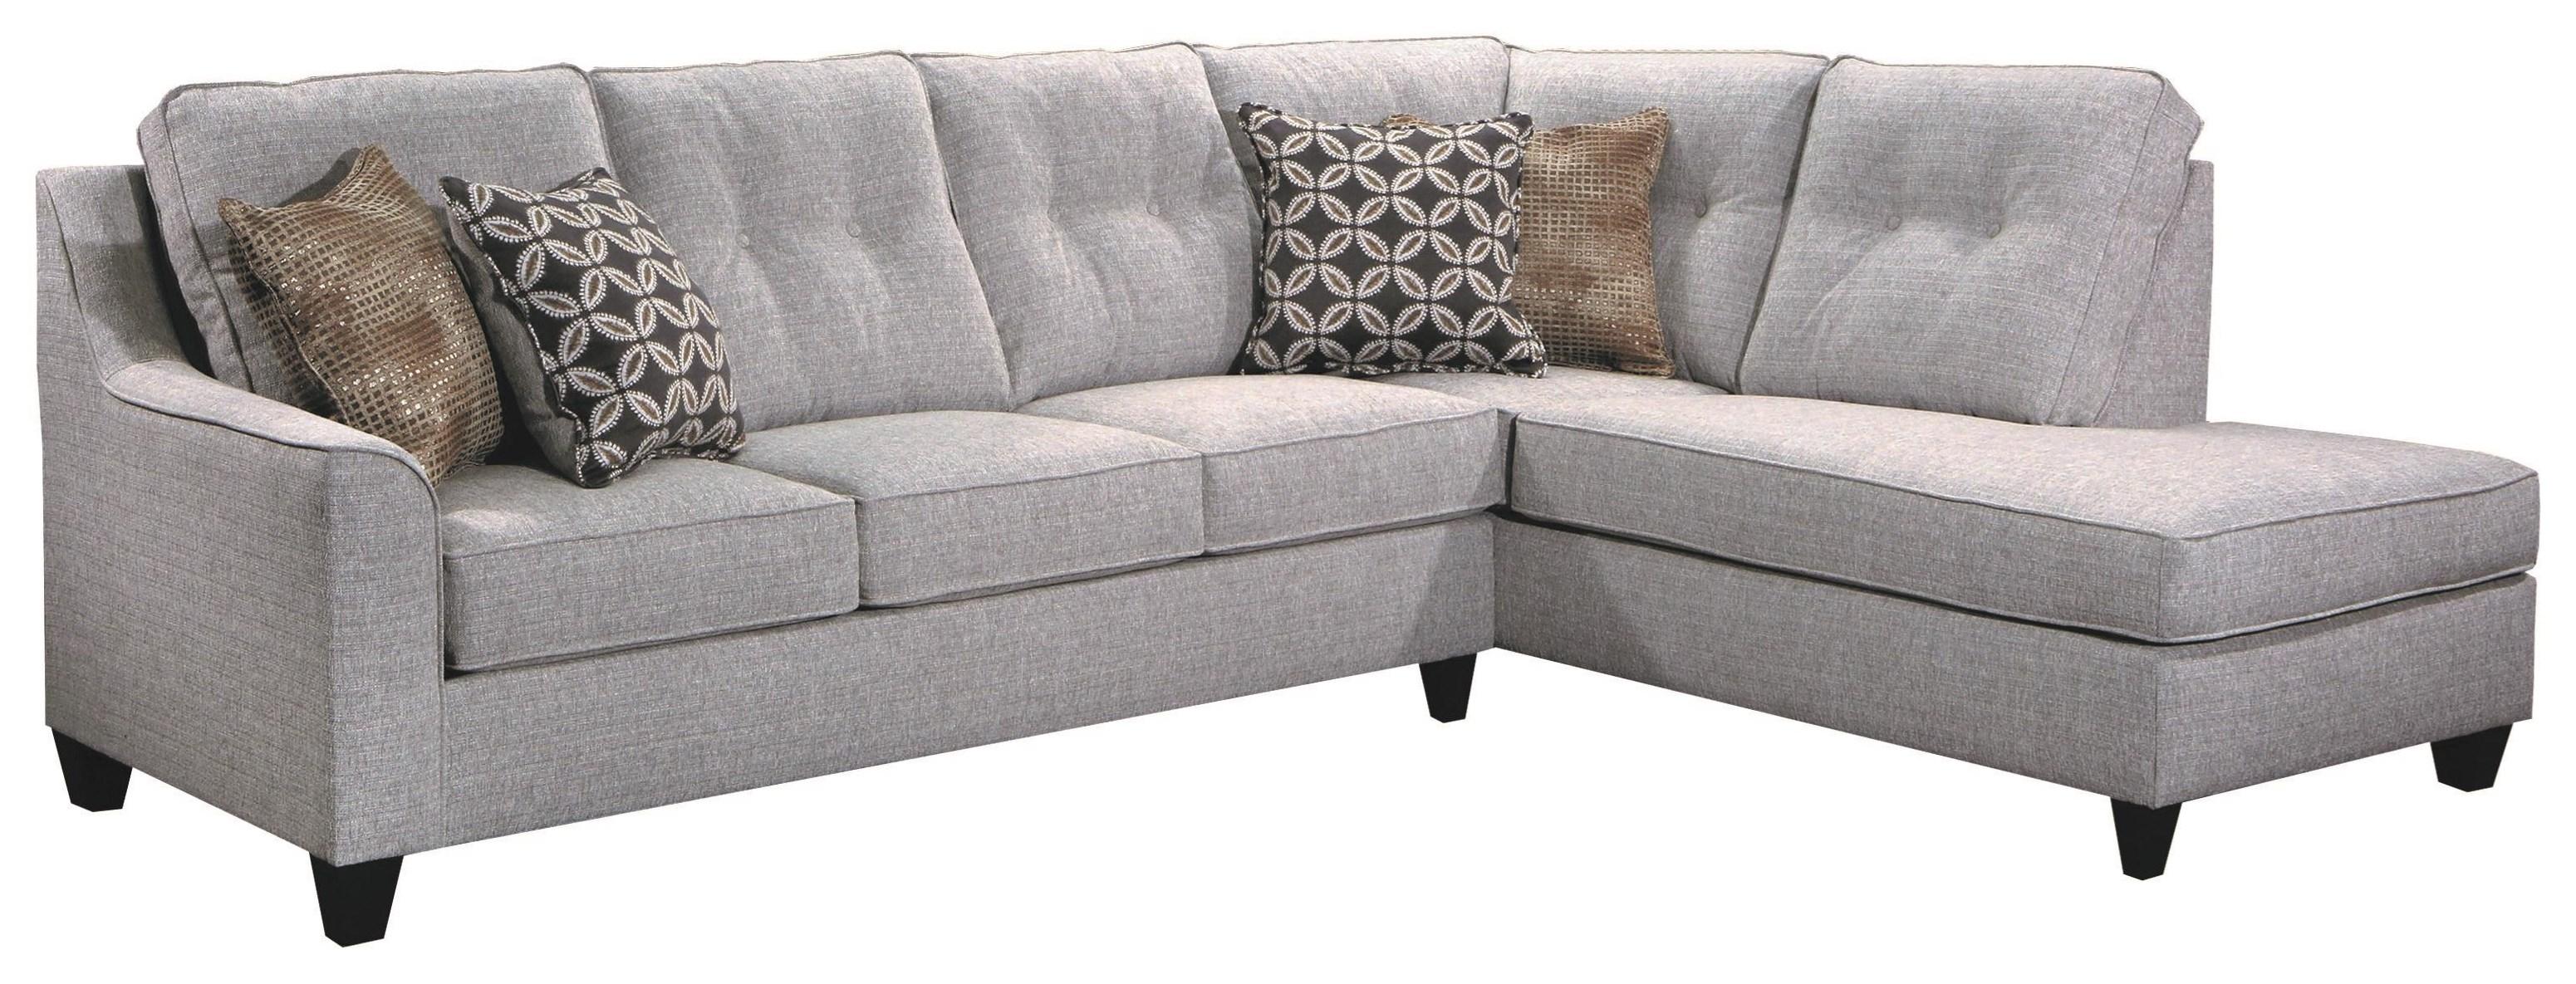 Olivia Sectional Sofa